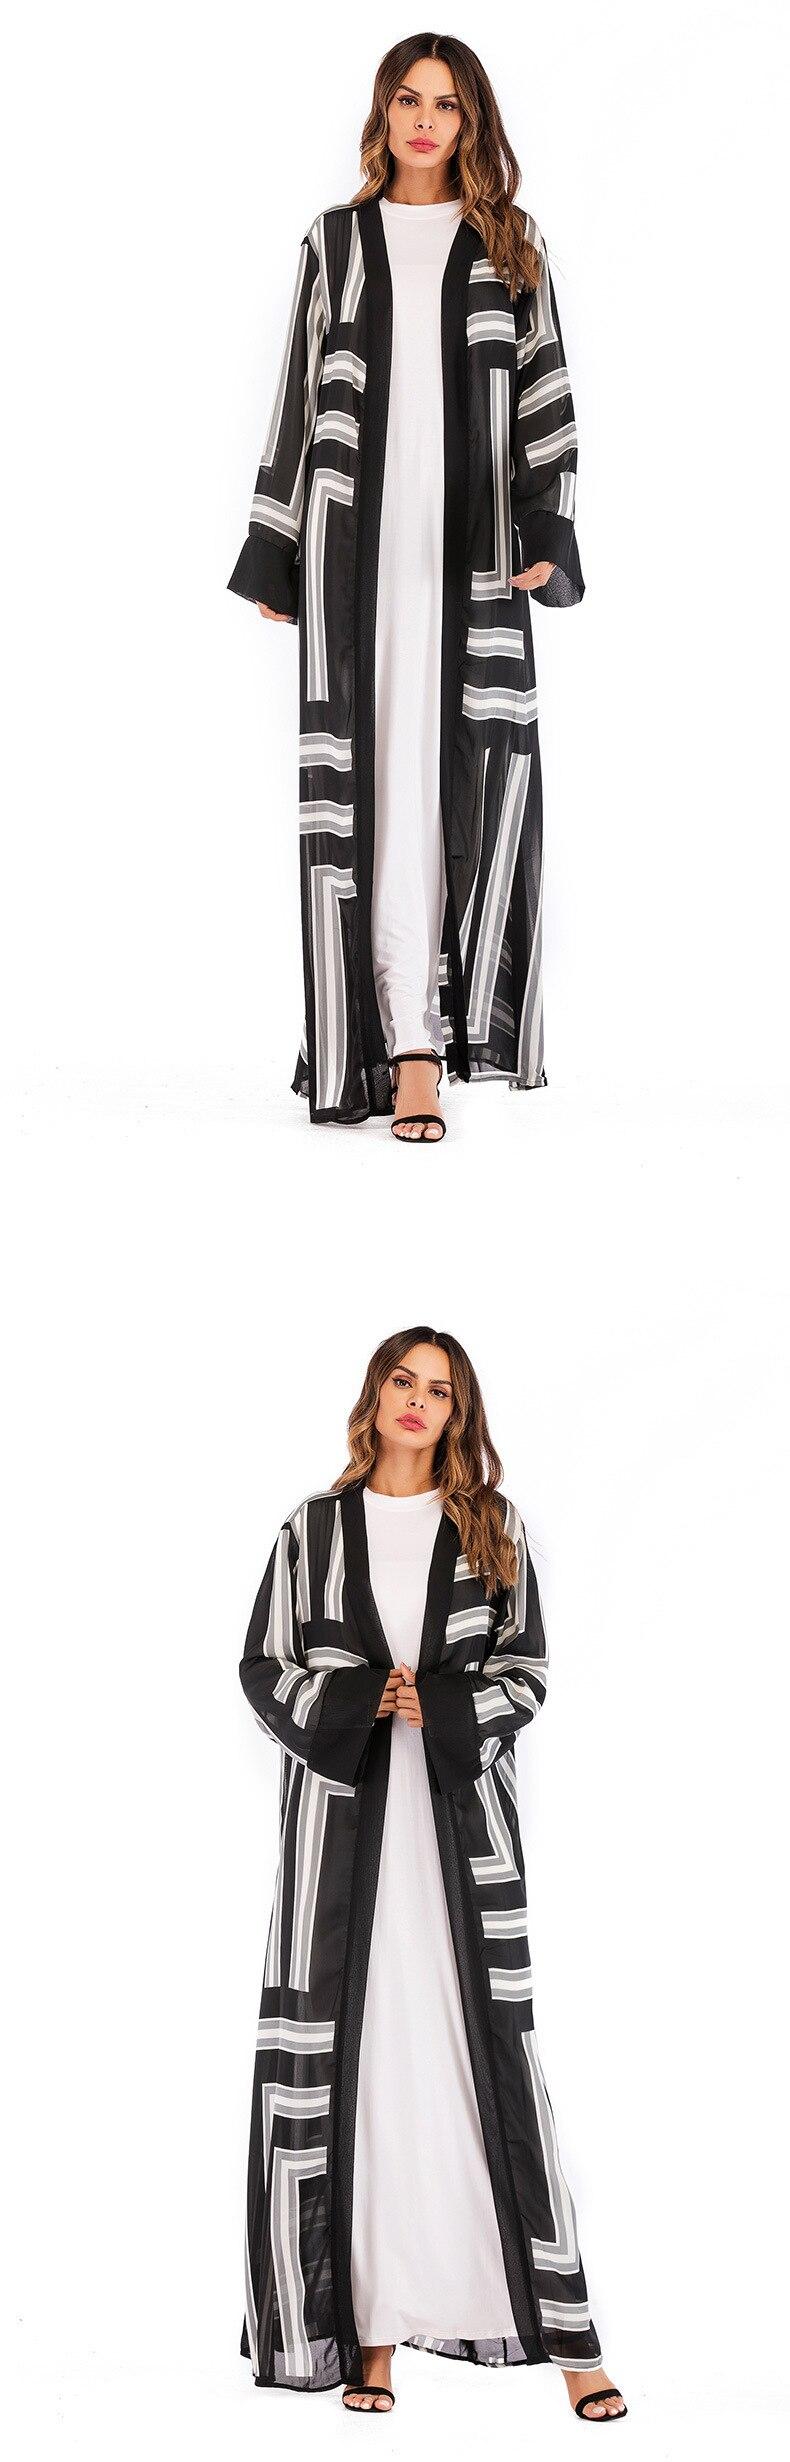 Muslim Abaya UAE Maxi Dress Striped Cardigan Tunic Long Robe Gowns Jubah Kimono Ramadan Arab Islamic Turkish Worship Service